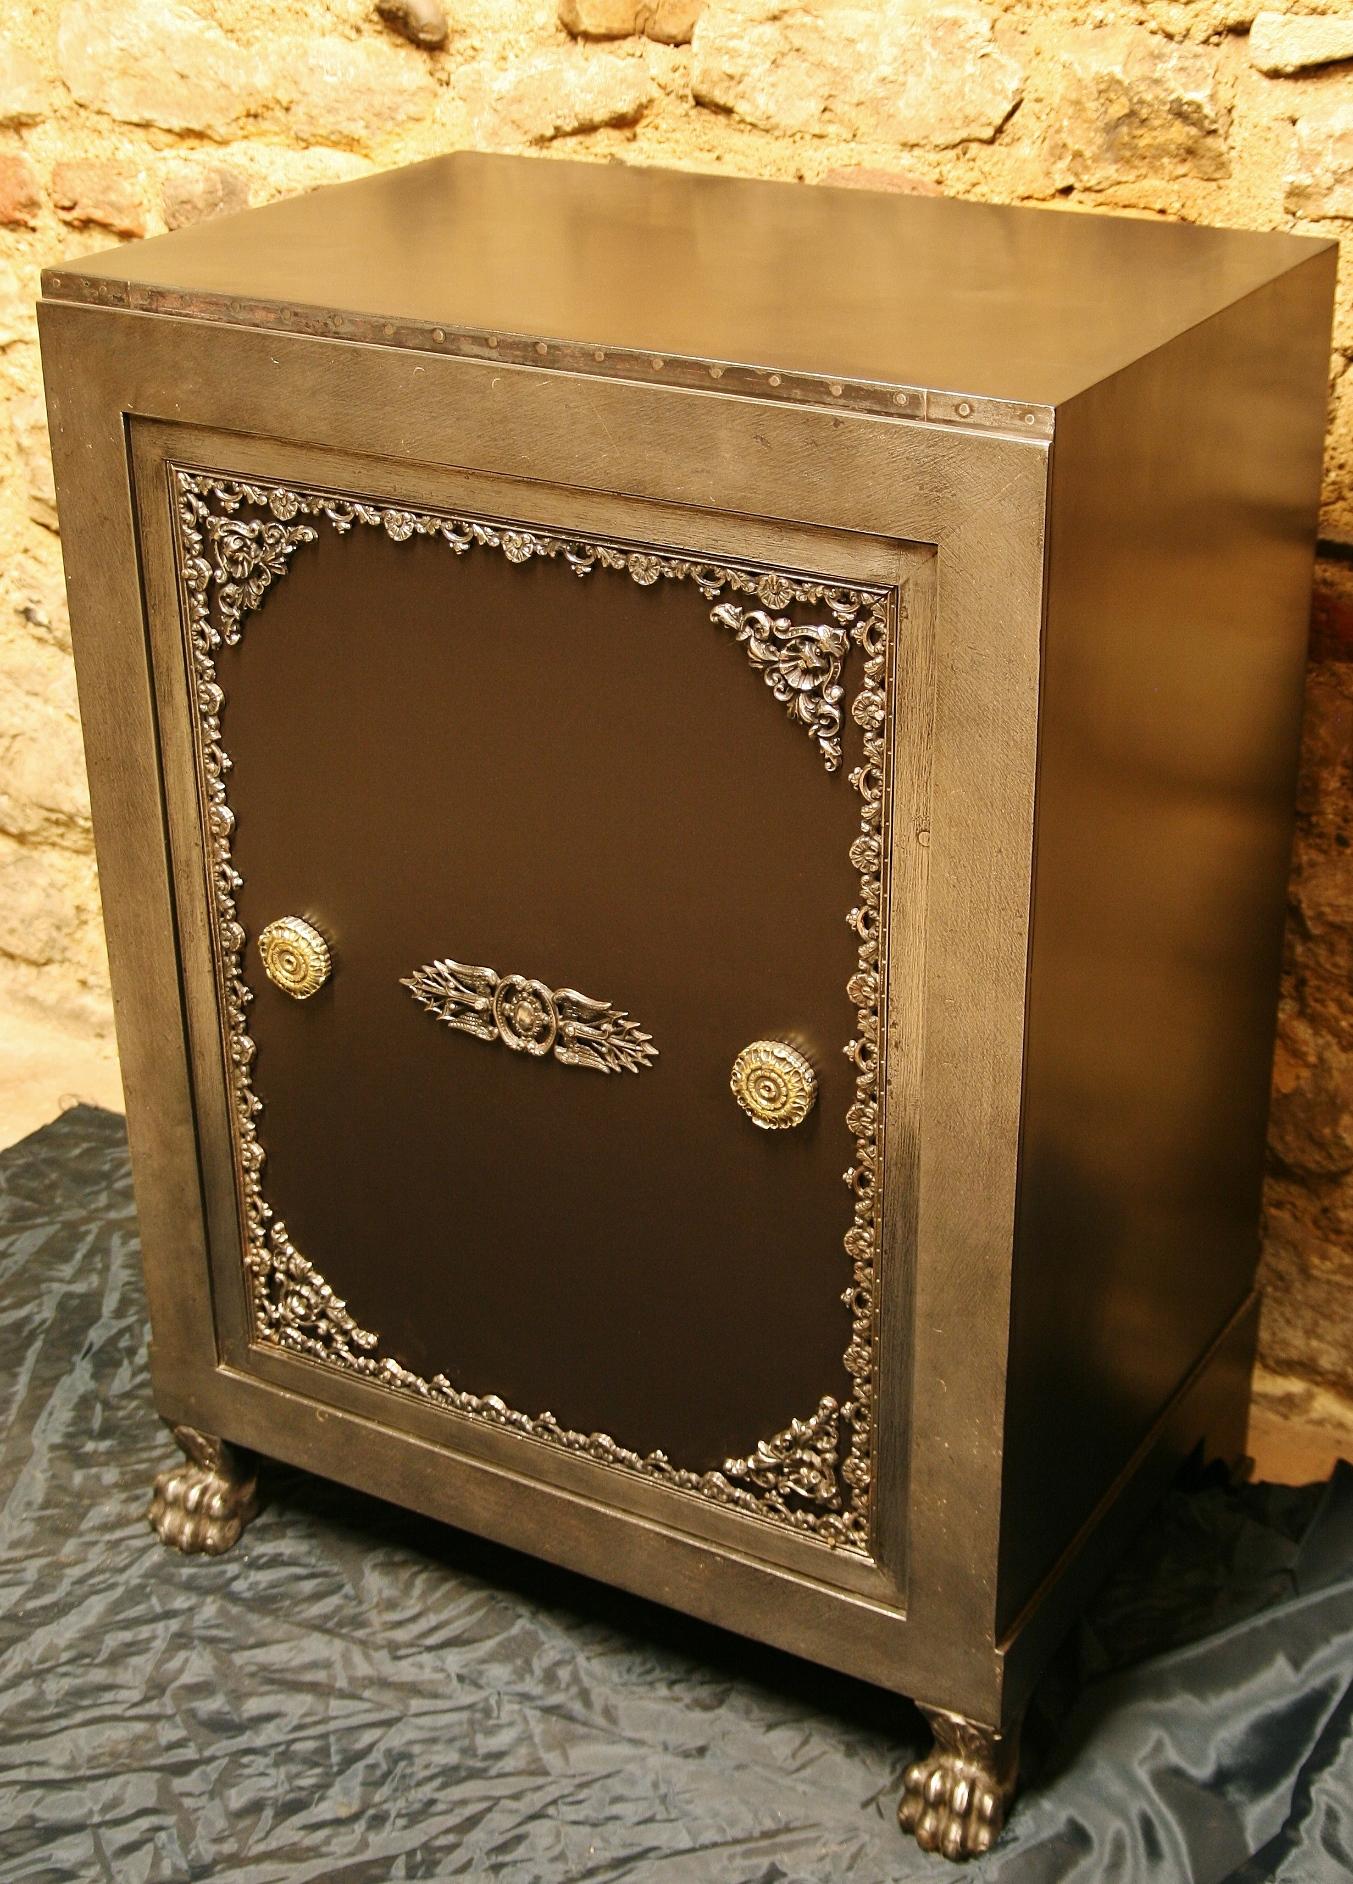 antica cassaforte, antiker Tresor, antique safe